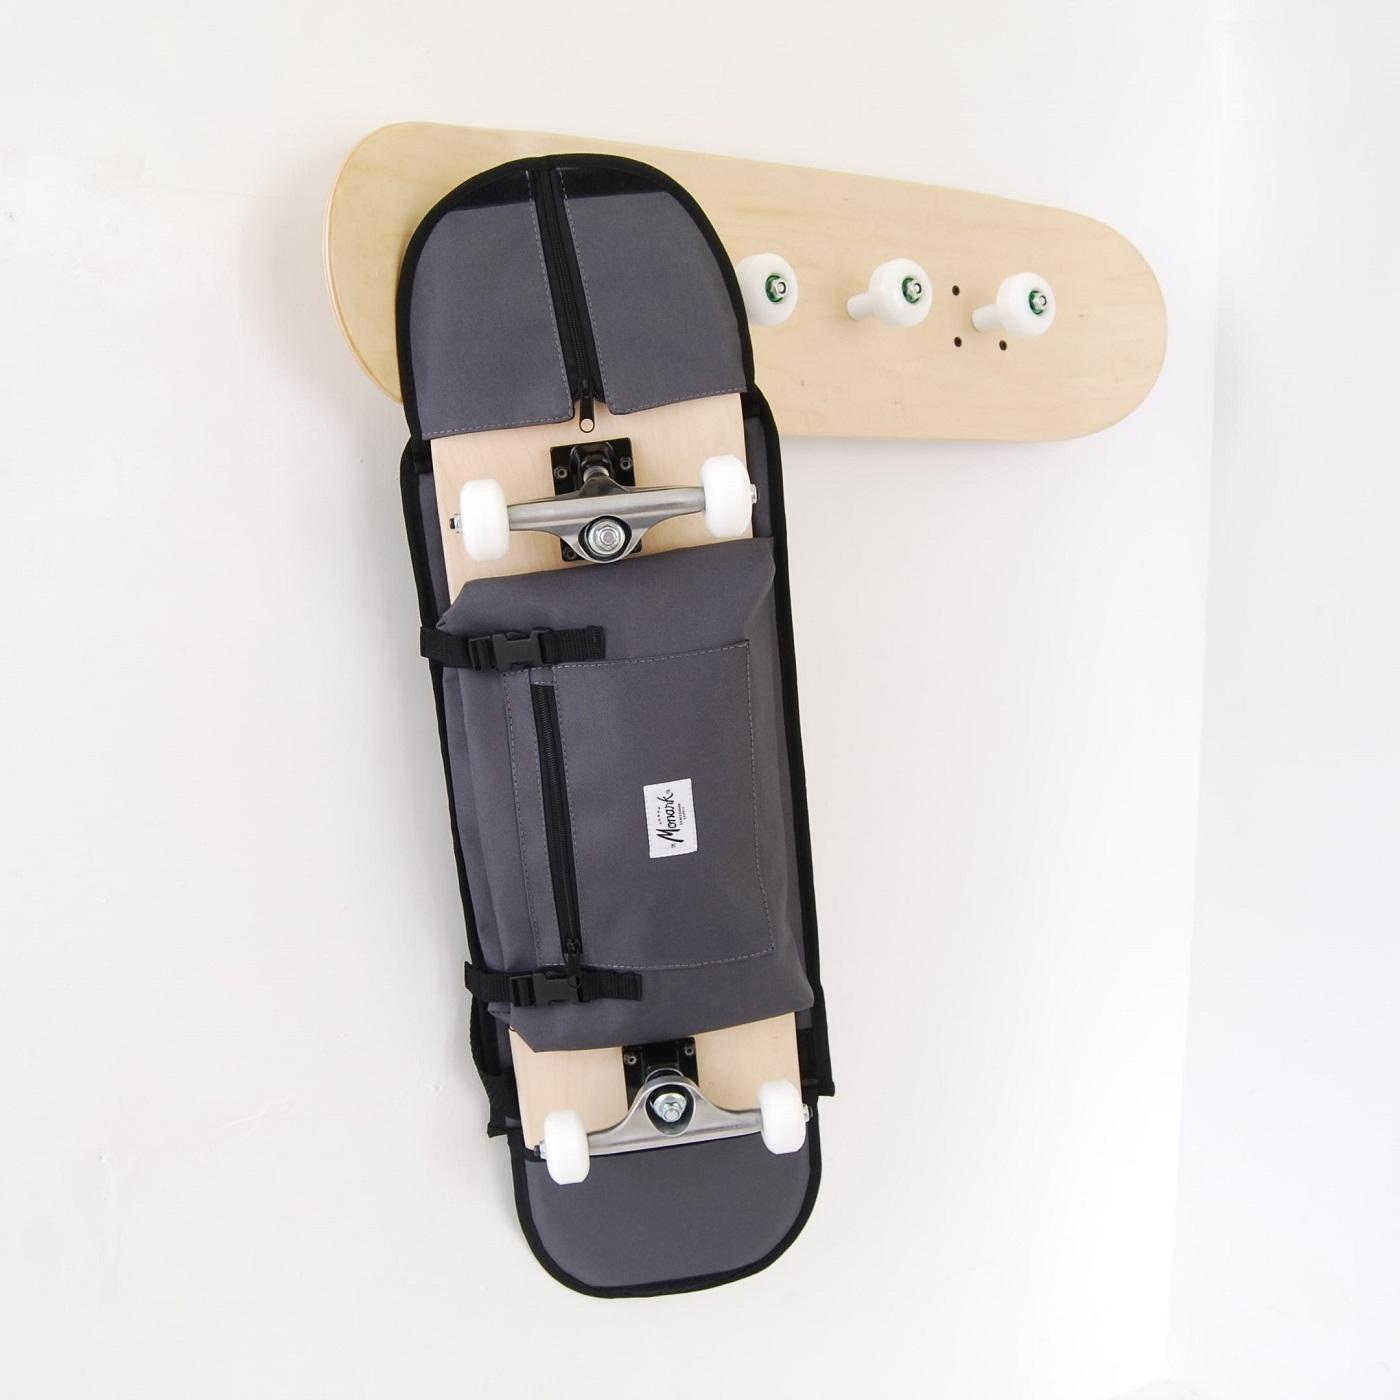 sacs dos skate pour gar ons sont parfaits pour marque skate pr f r e. Black Bedroom Furniture Sets. Home Design Ideas